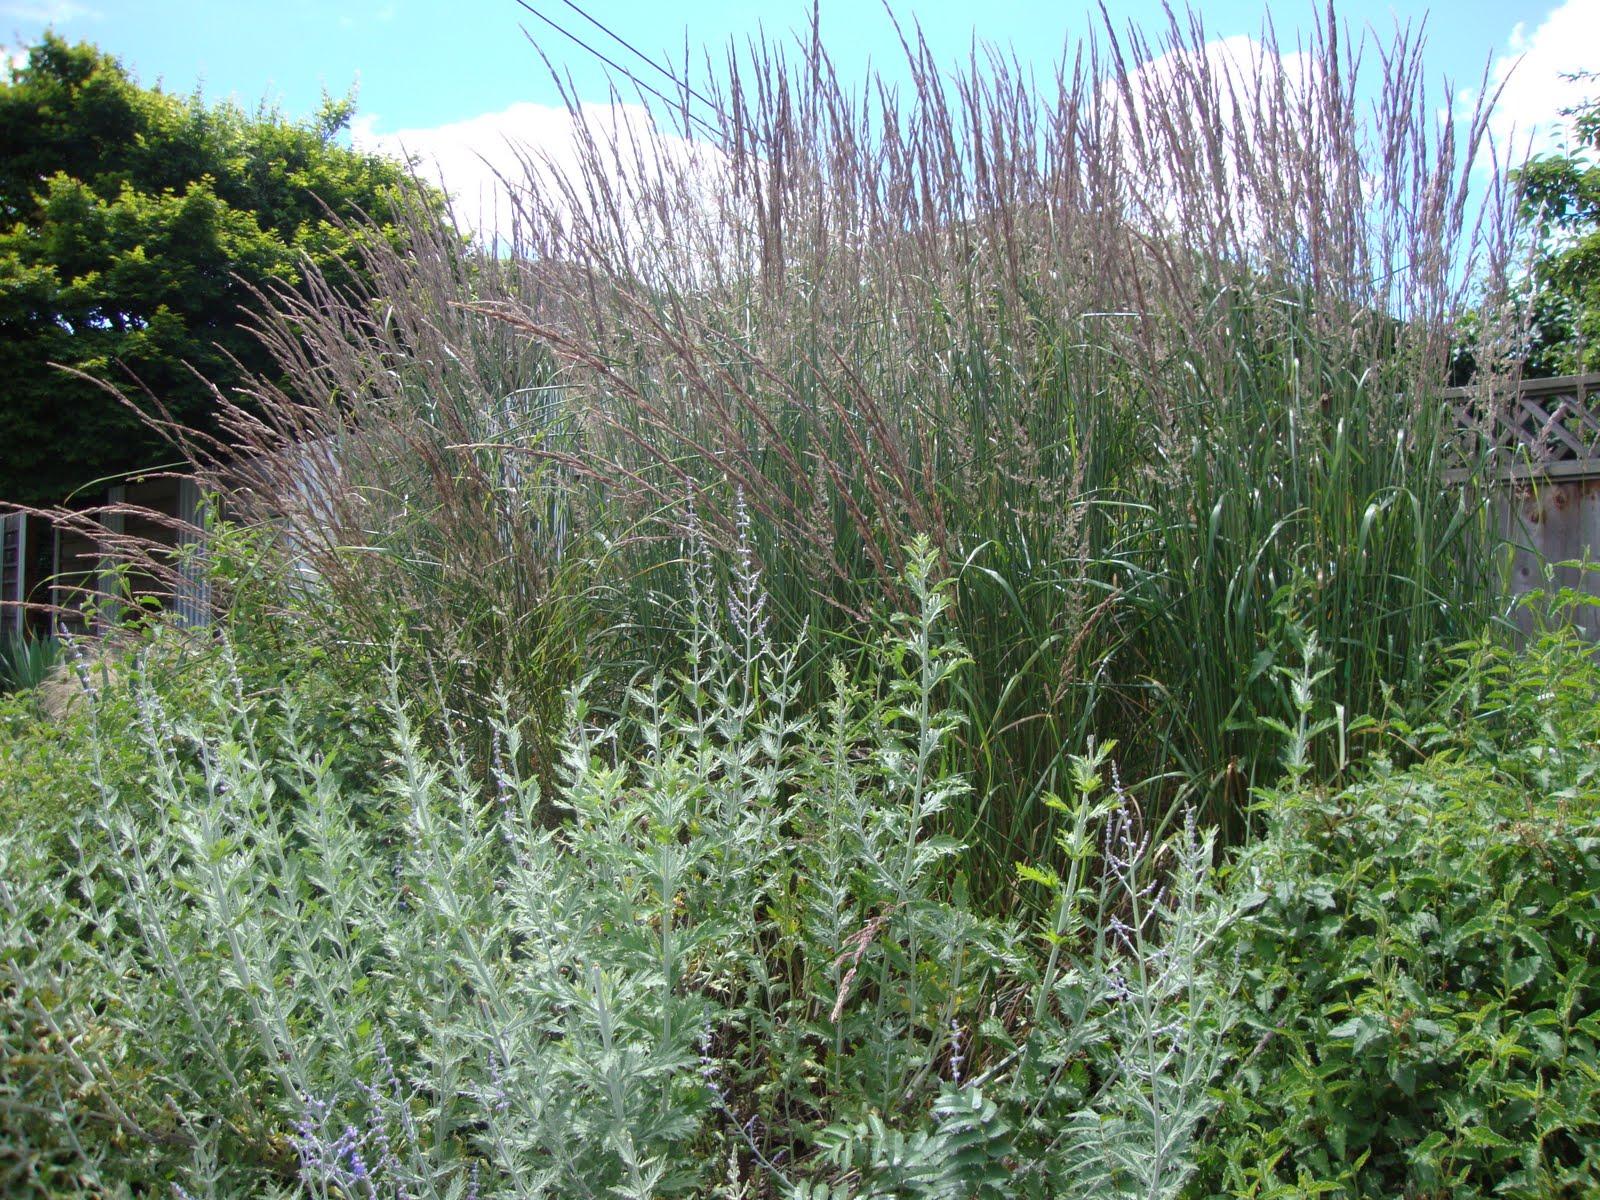 Danger garden gardening with grasses not lawn for Best grass for garden